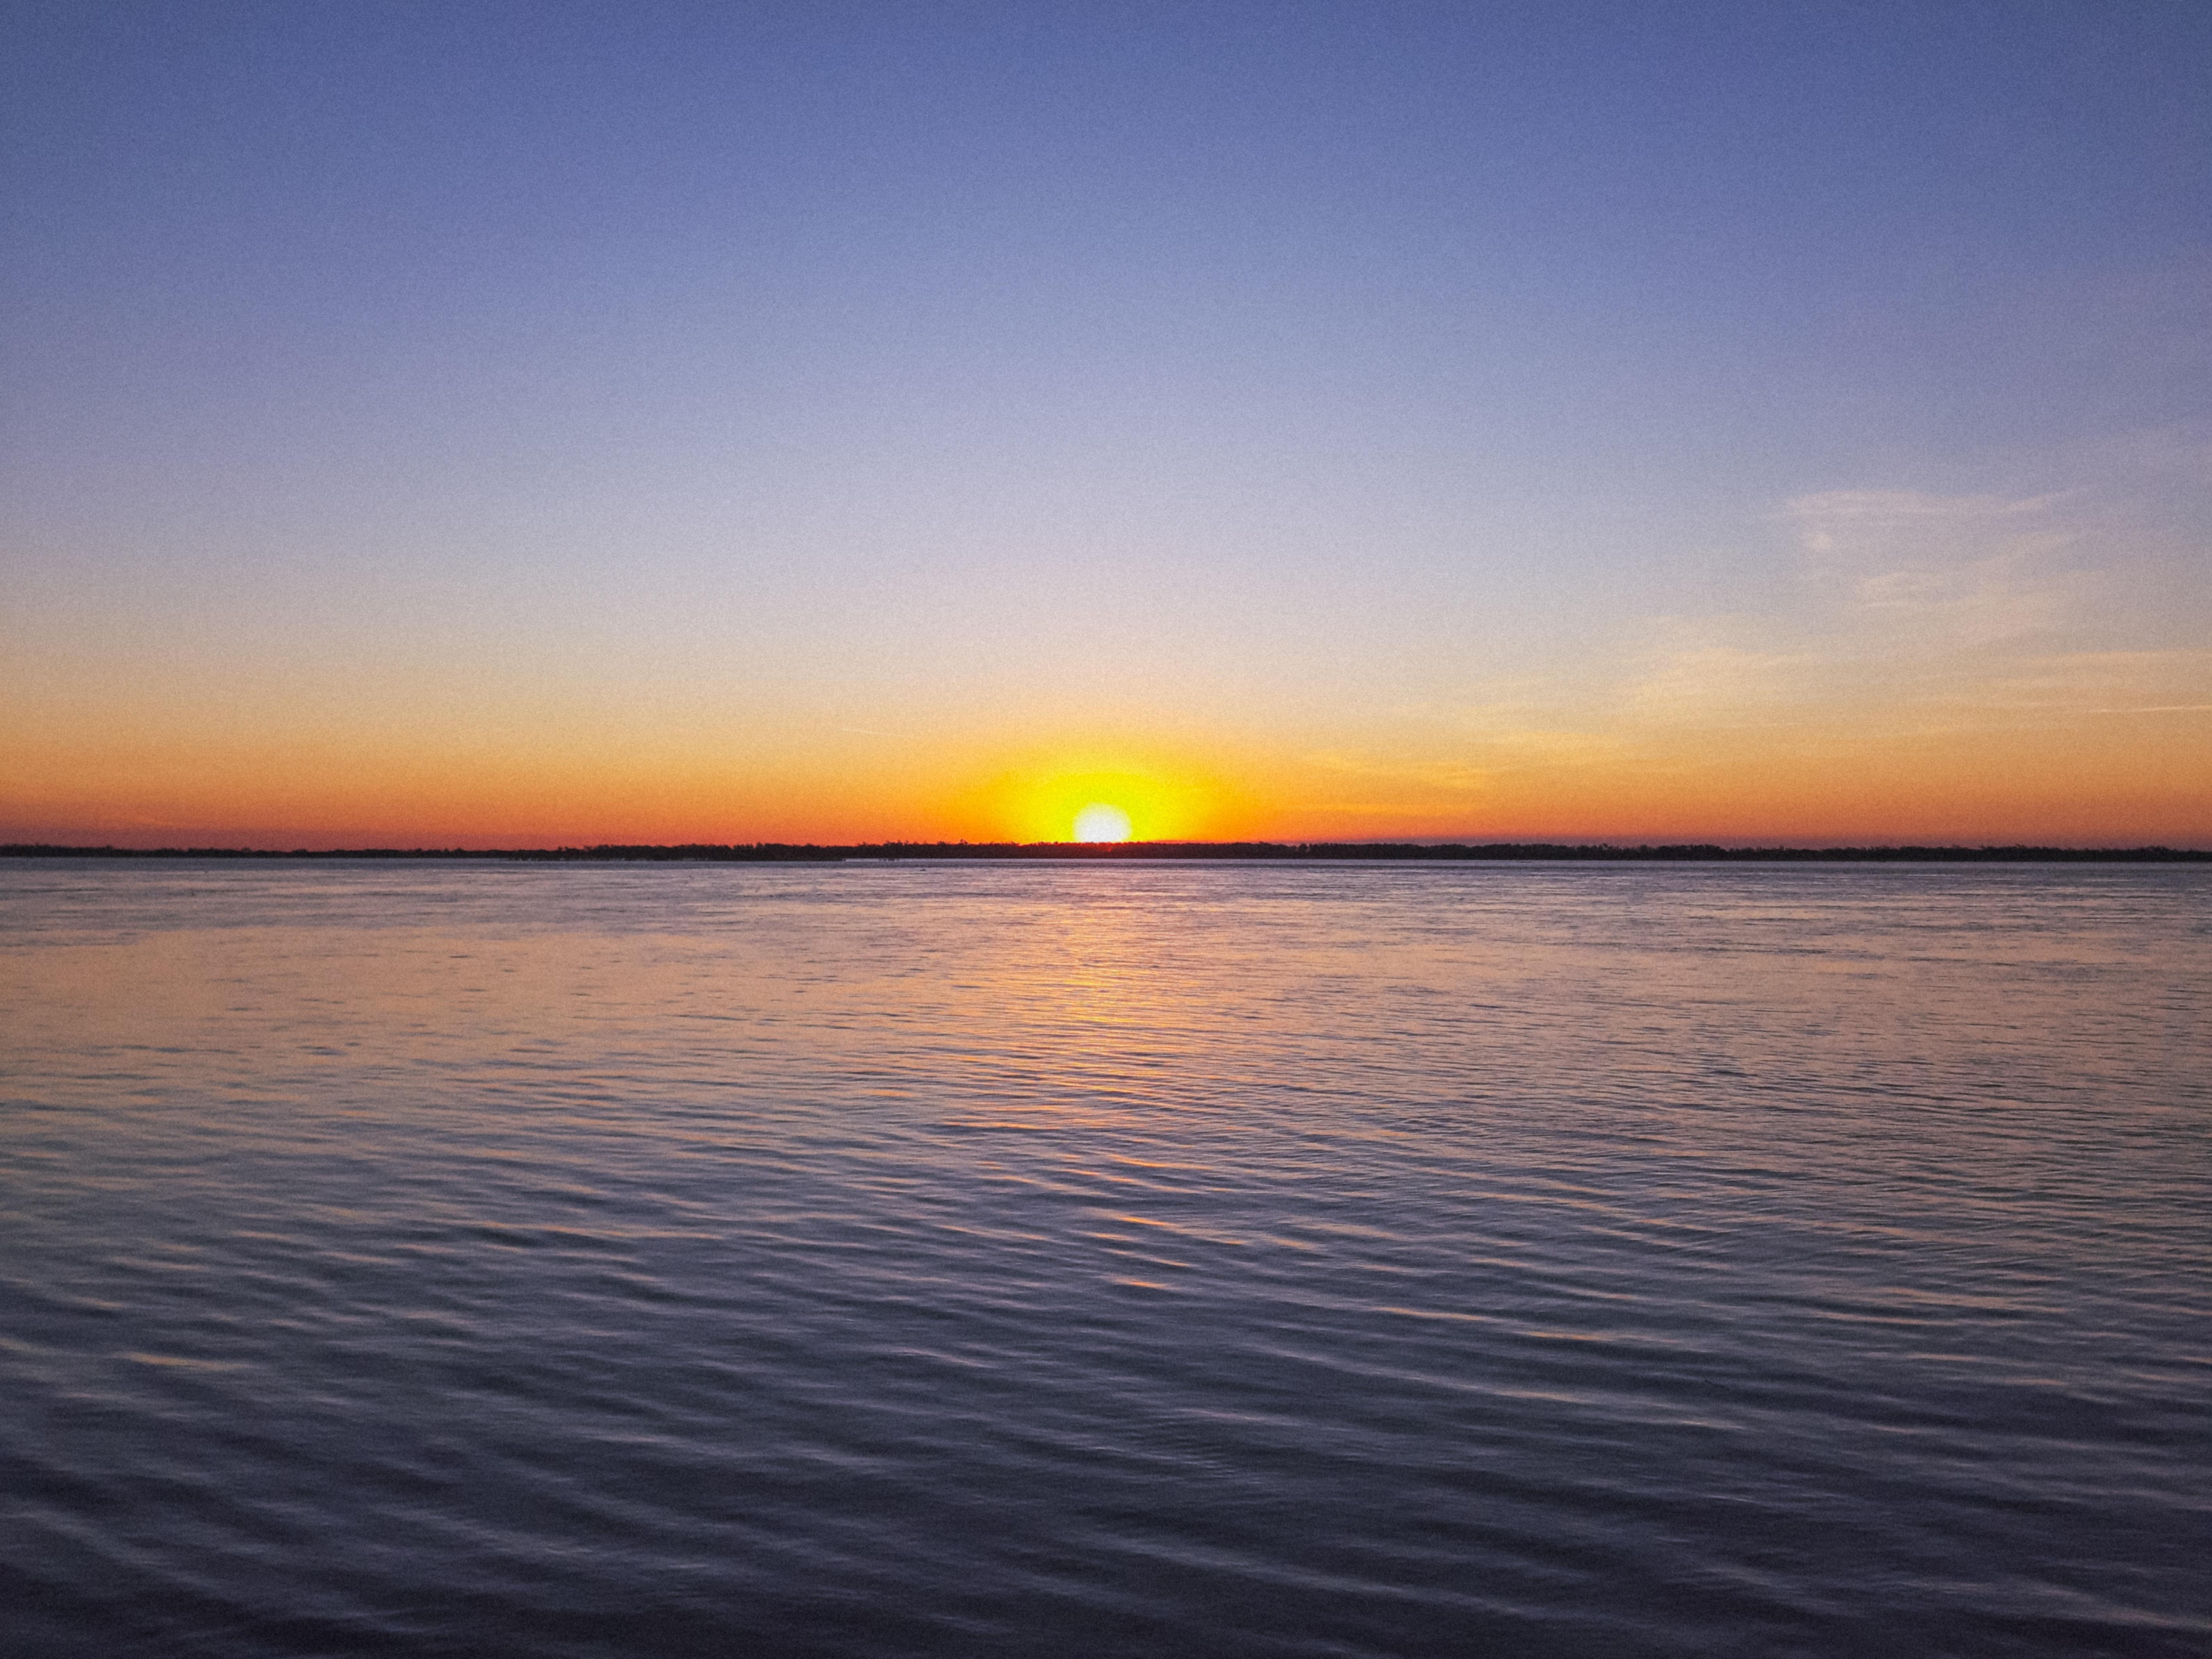 blue calm sea during sunrise